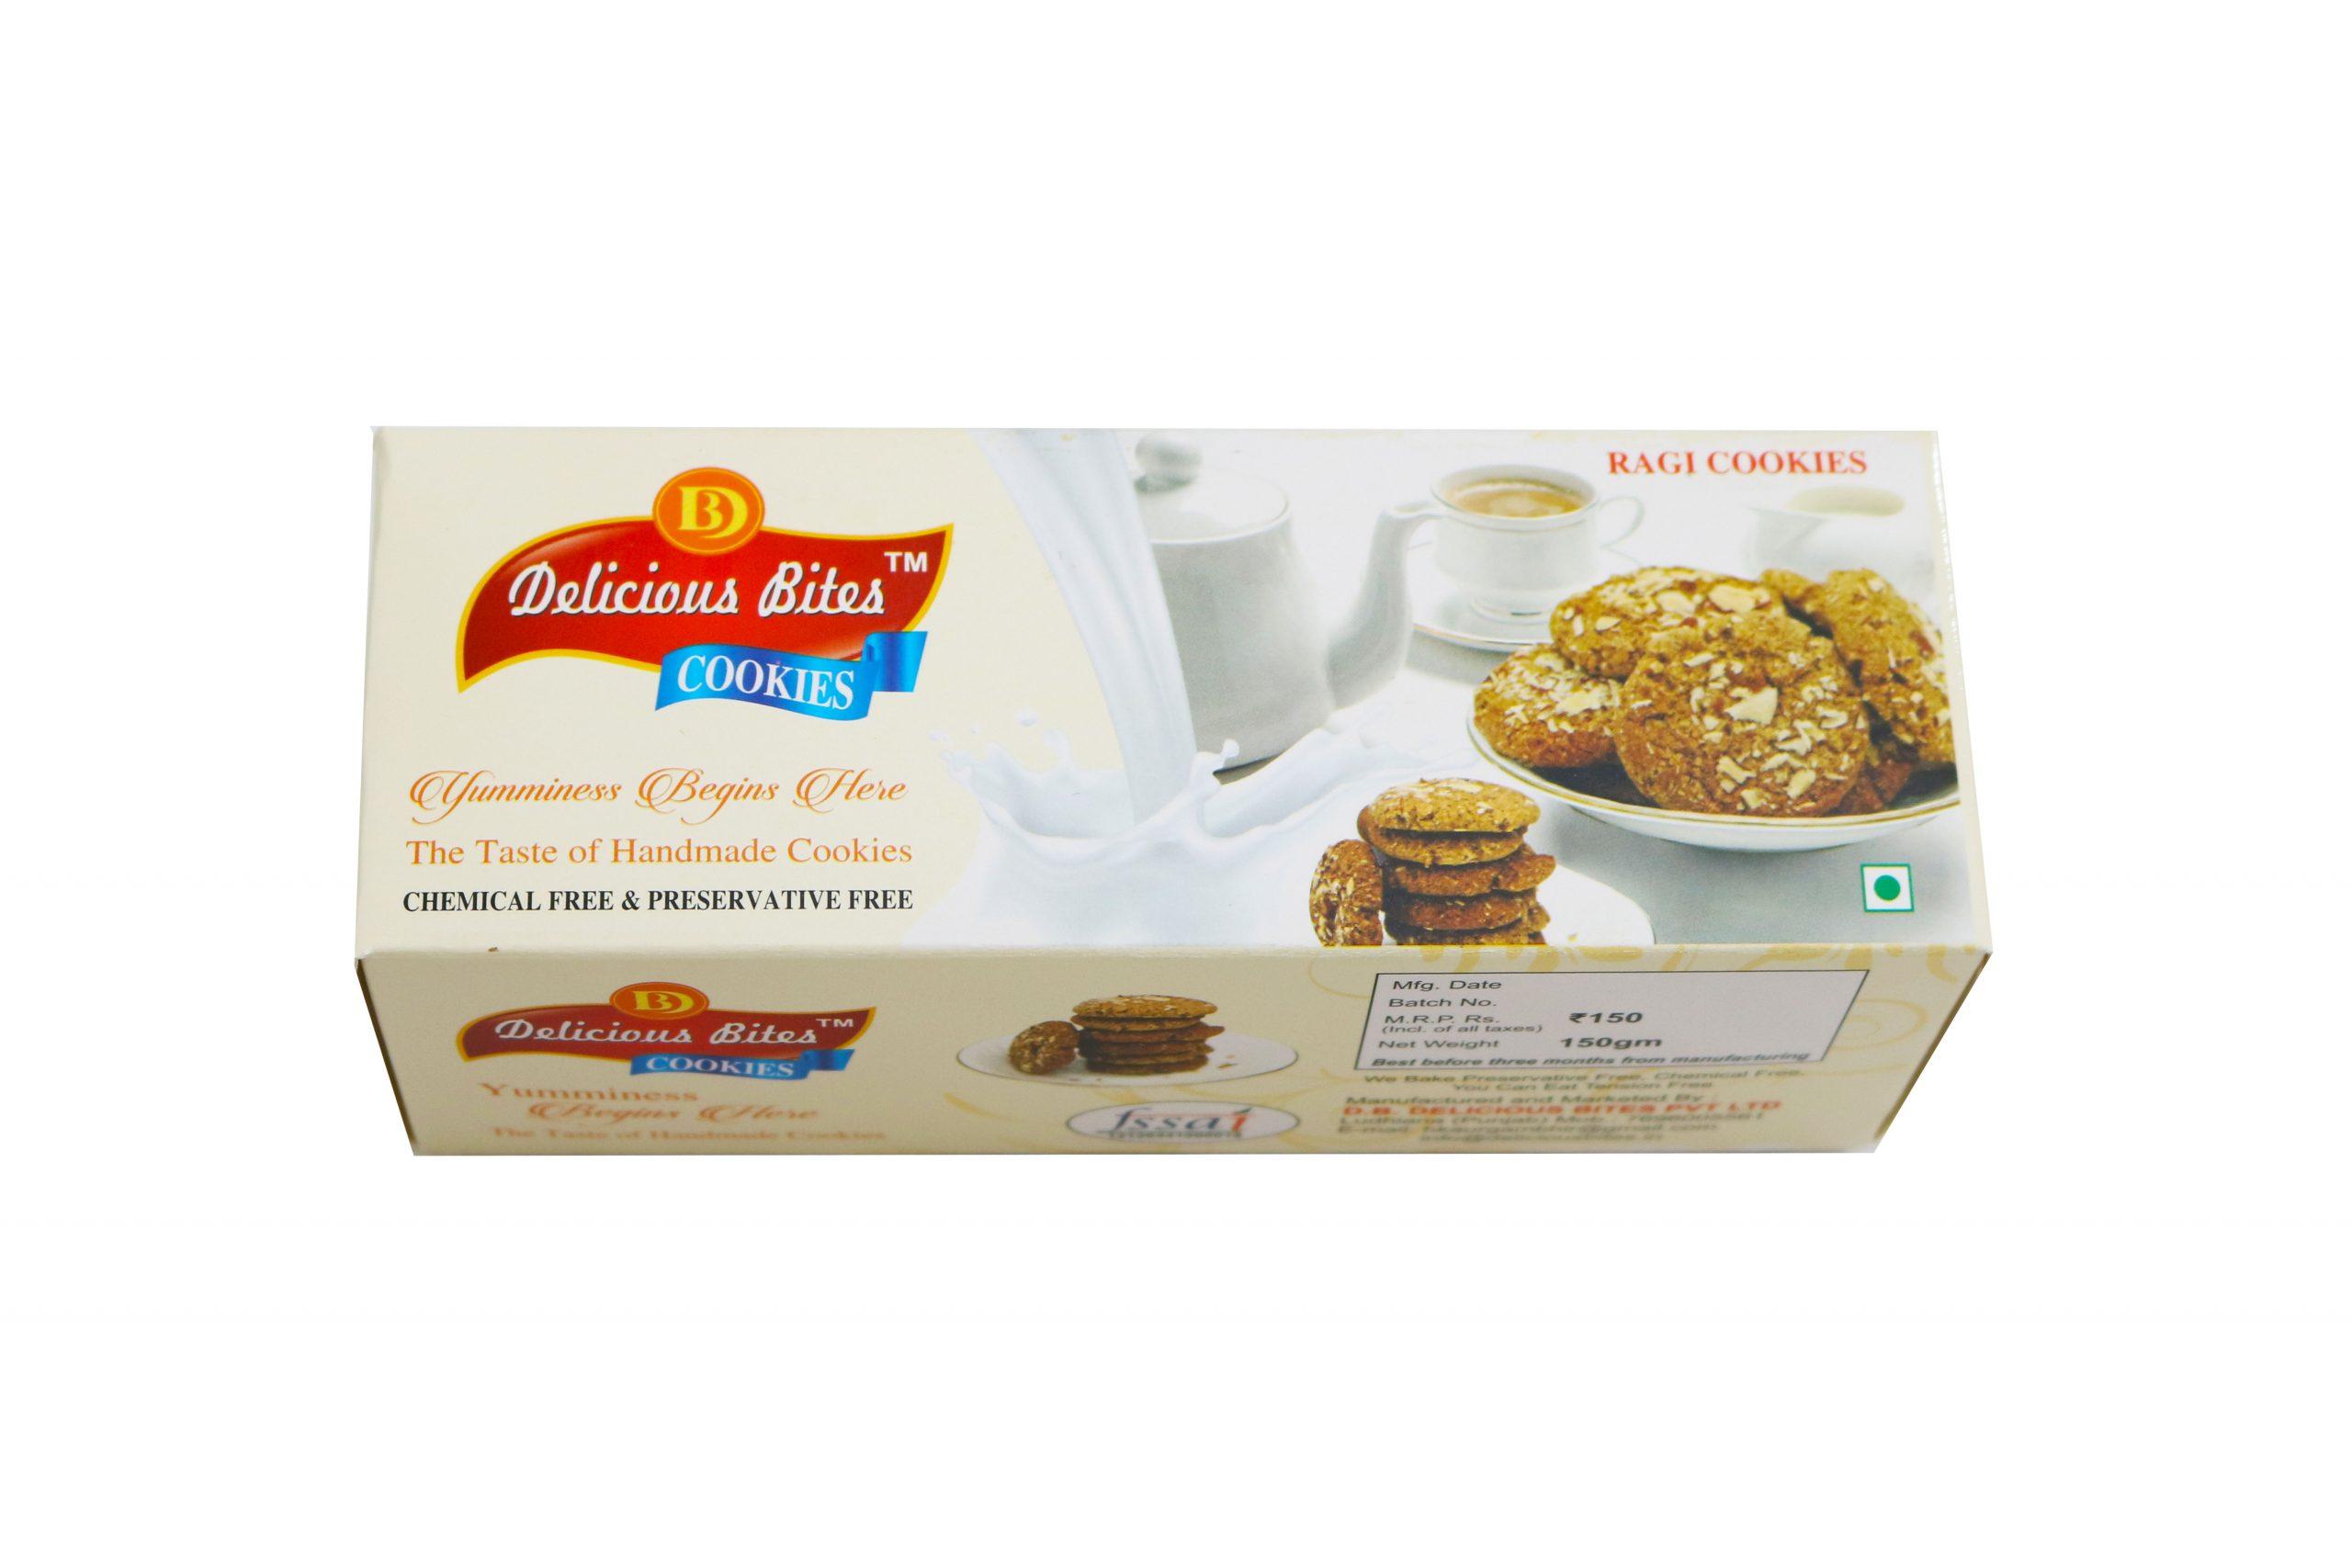 Best Pure Veg bakery Cakes in Ludhiana